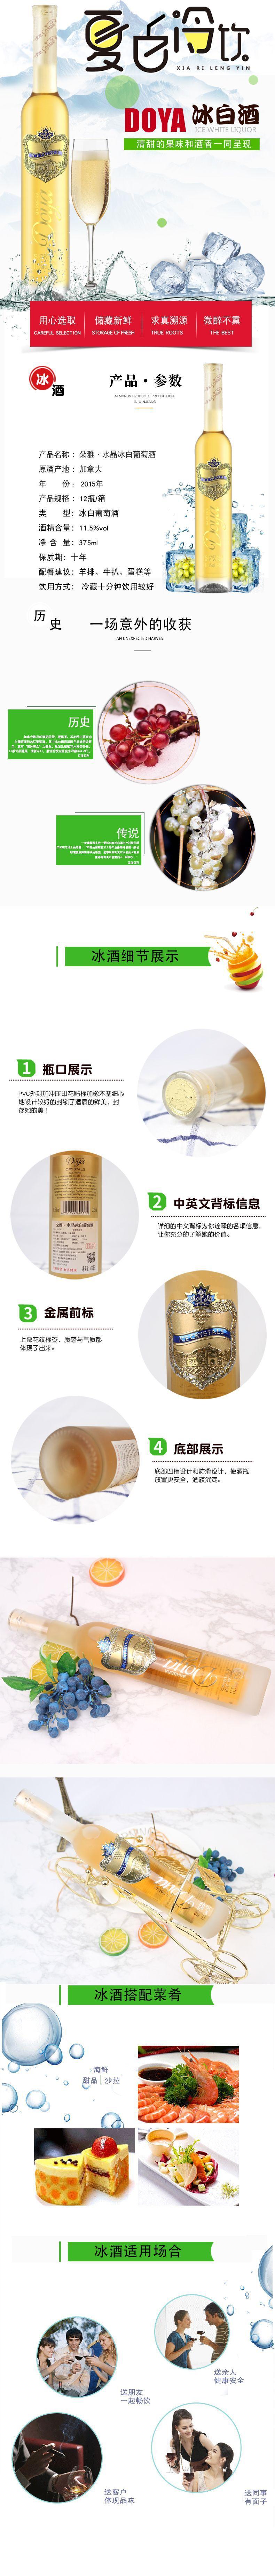 http://www2.huanlvhui.net/attachment/images/6/merch/155/i8QvXQxq8sA75X1158o15zC33la1iX.jpg